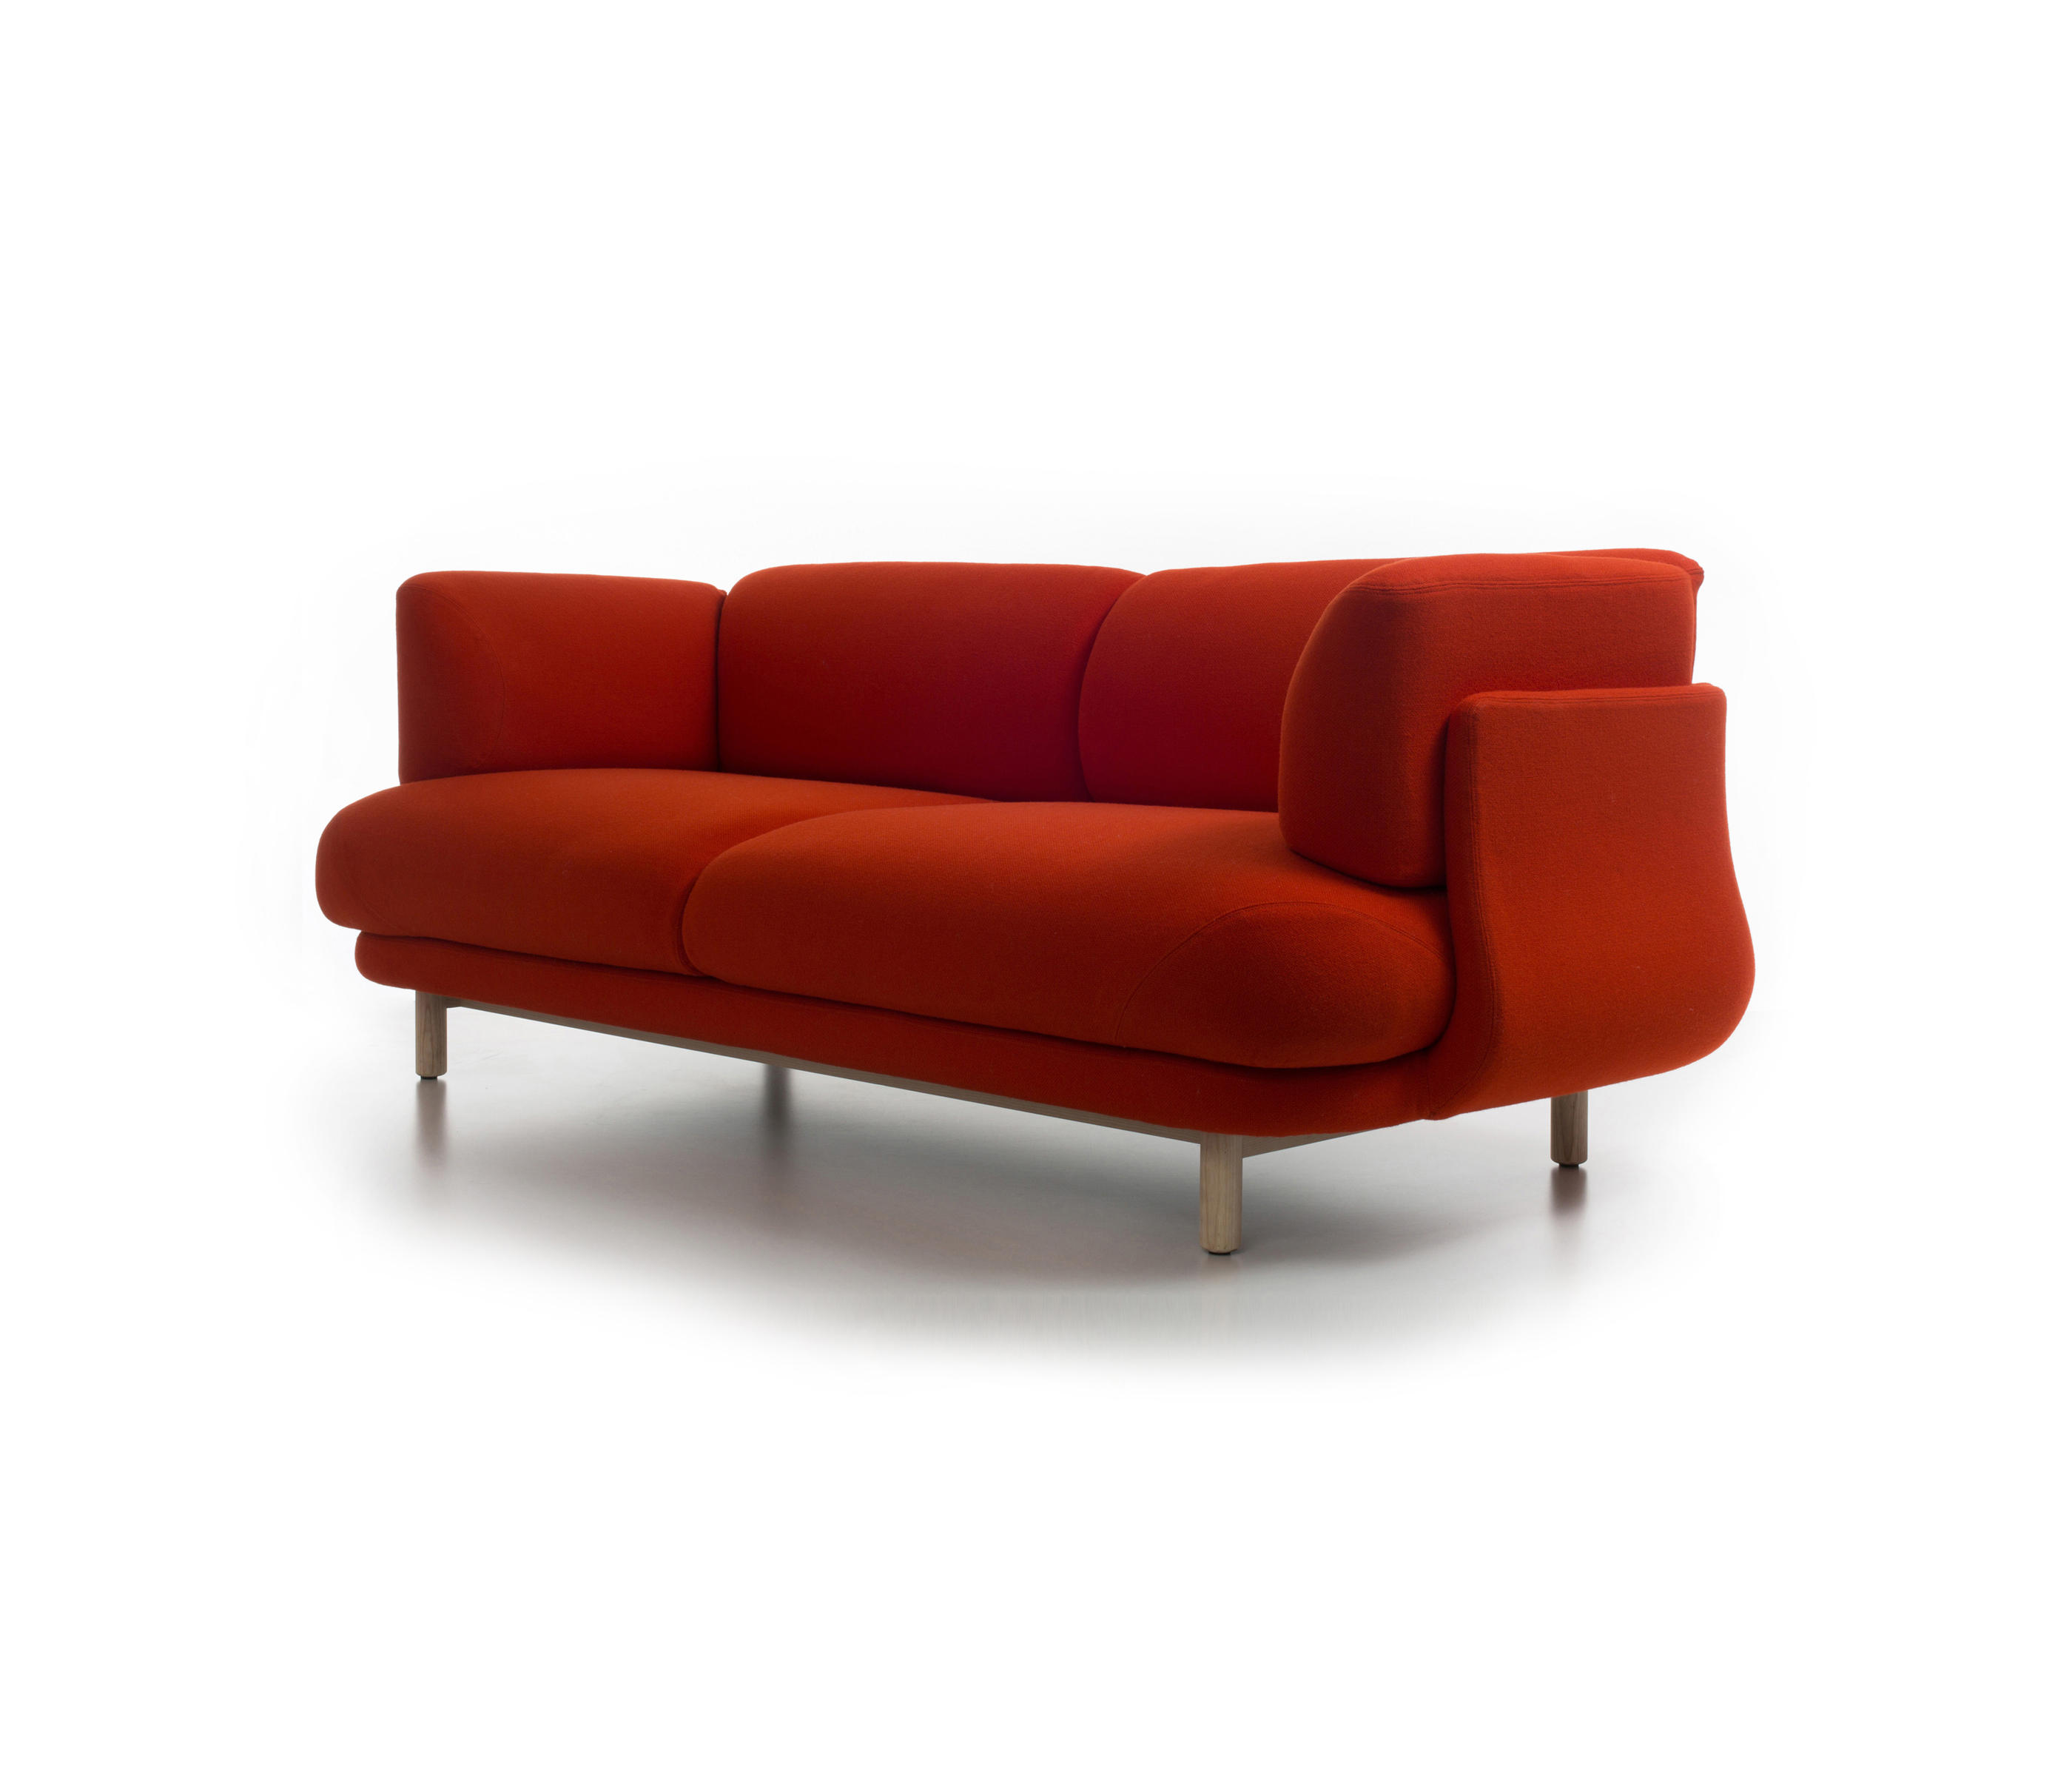 PEG SOFA - Sofas from Cappellini  aa7ef311ddb2